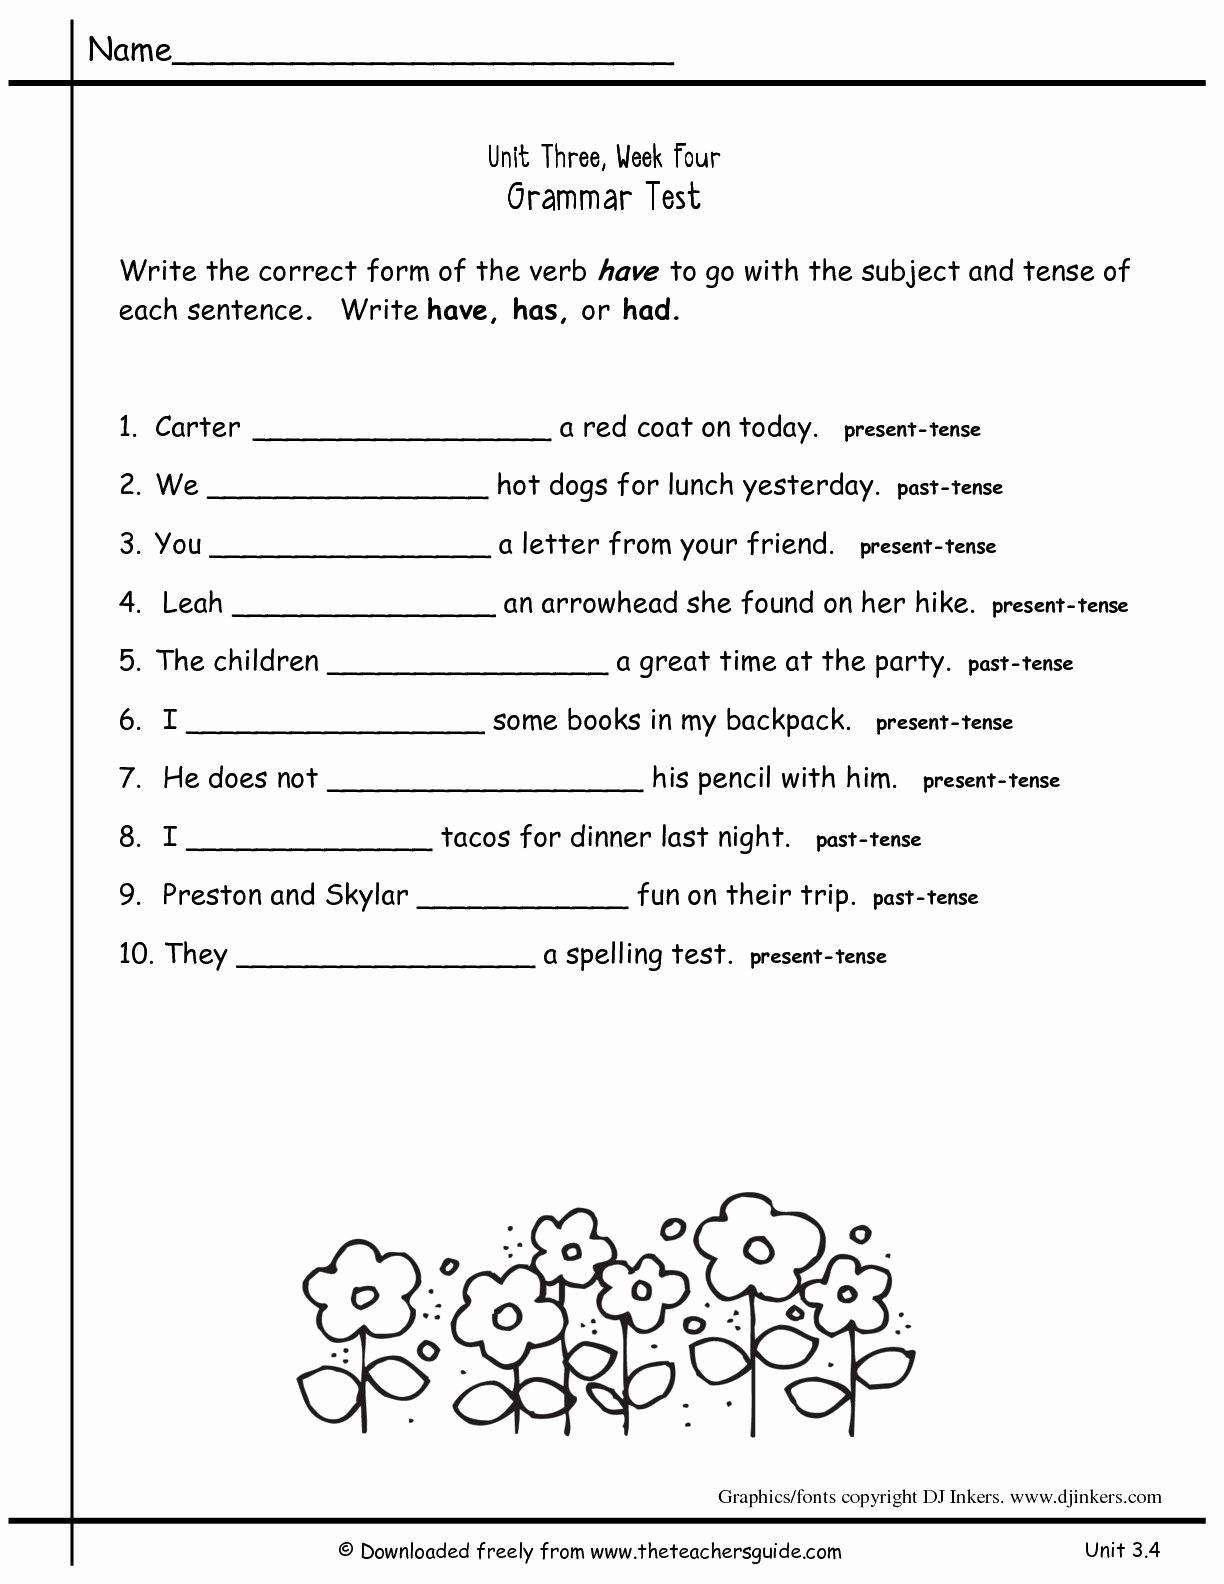 4th Grade Vocabulary Worksheets Pdf Luxury 4th Grade Grammar Worksheets Pdf